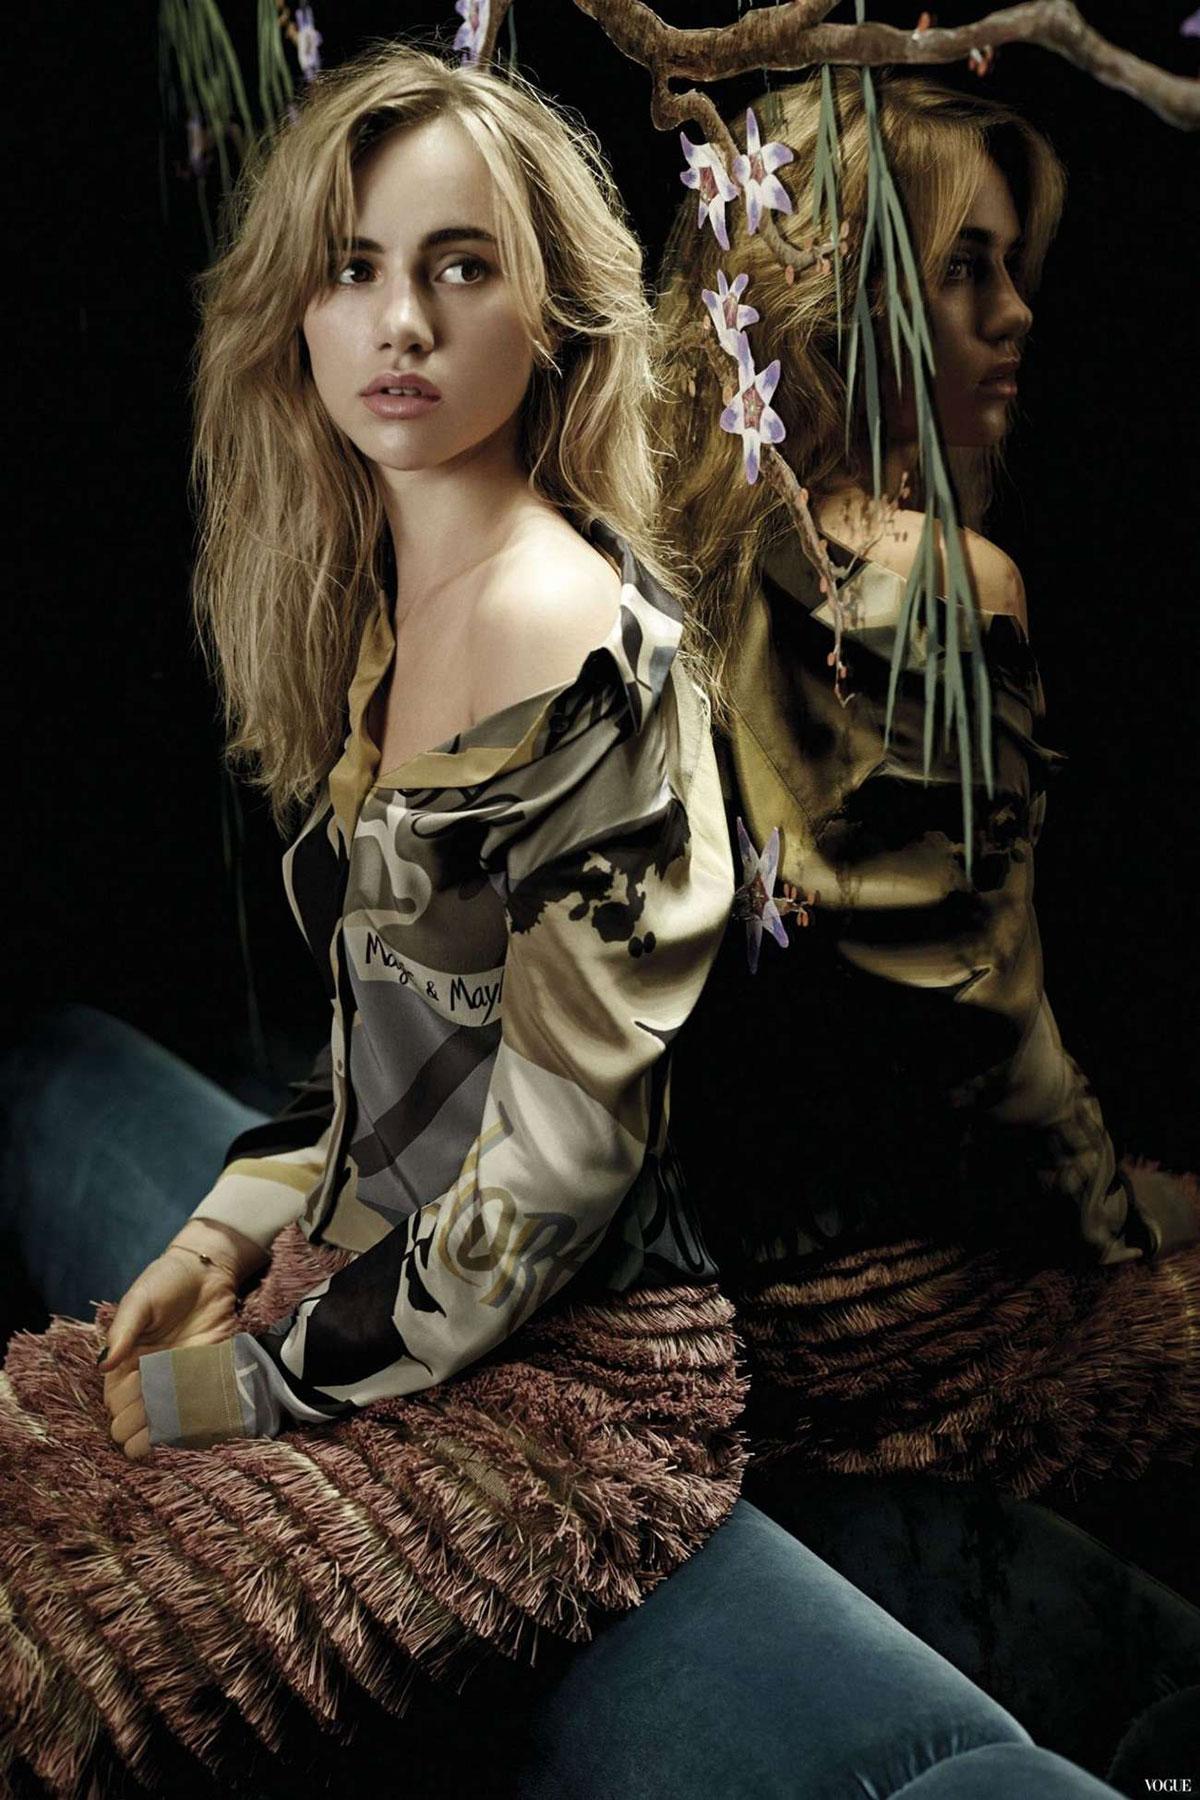 Suki Waterhouse - Photoshoot for Marie Claire Magazine